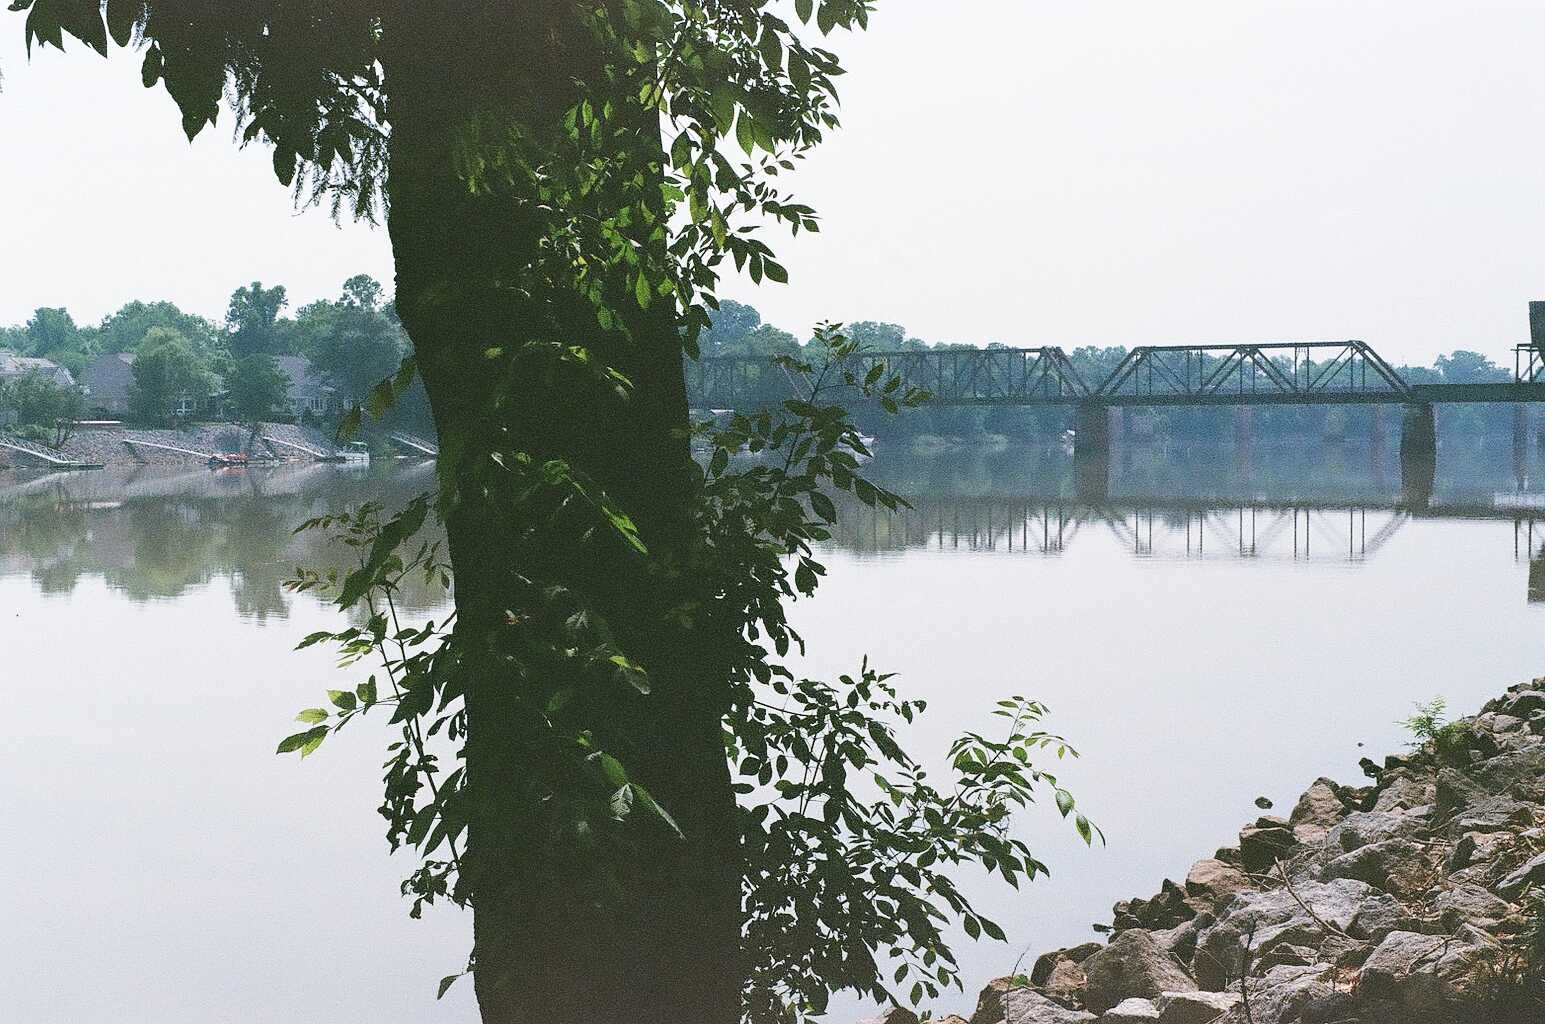 Railroad Bridge over the Savannah River in Augusta Georgia